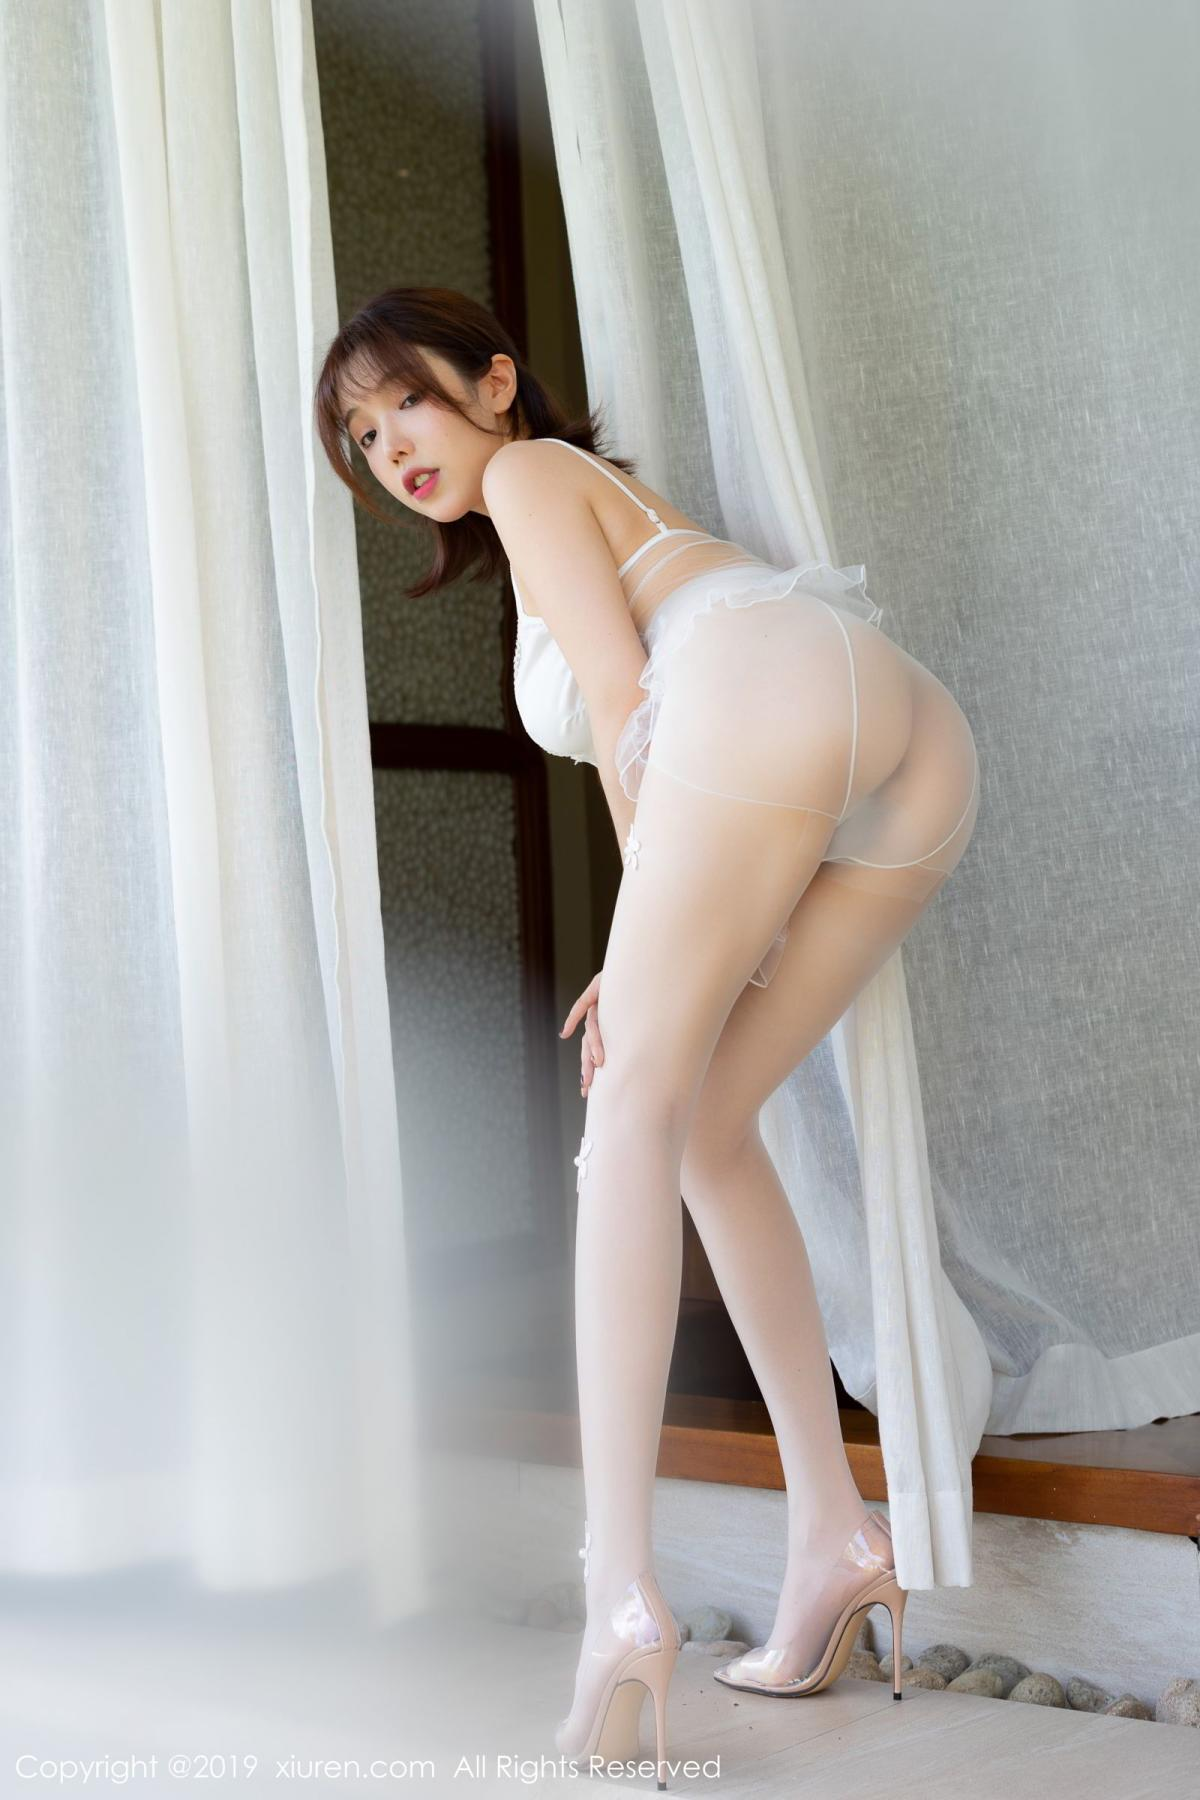 [XiuRen] Vol.1578 Huang Le Ran 39P, Huang Le Ran, Underwear, Xiuren